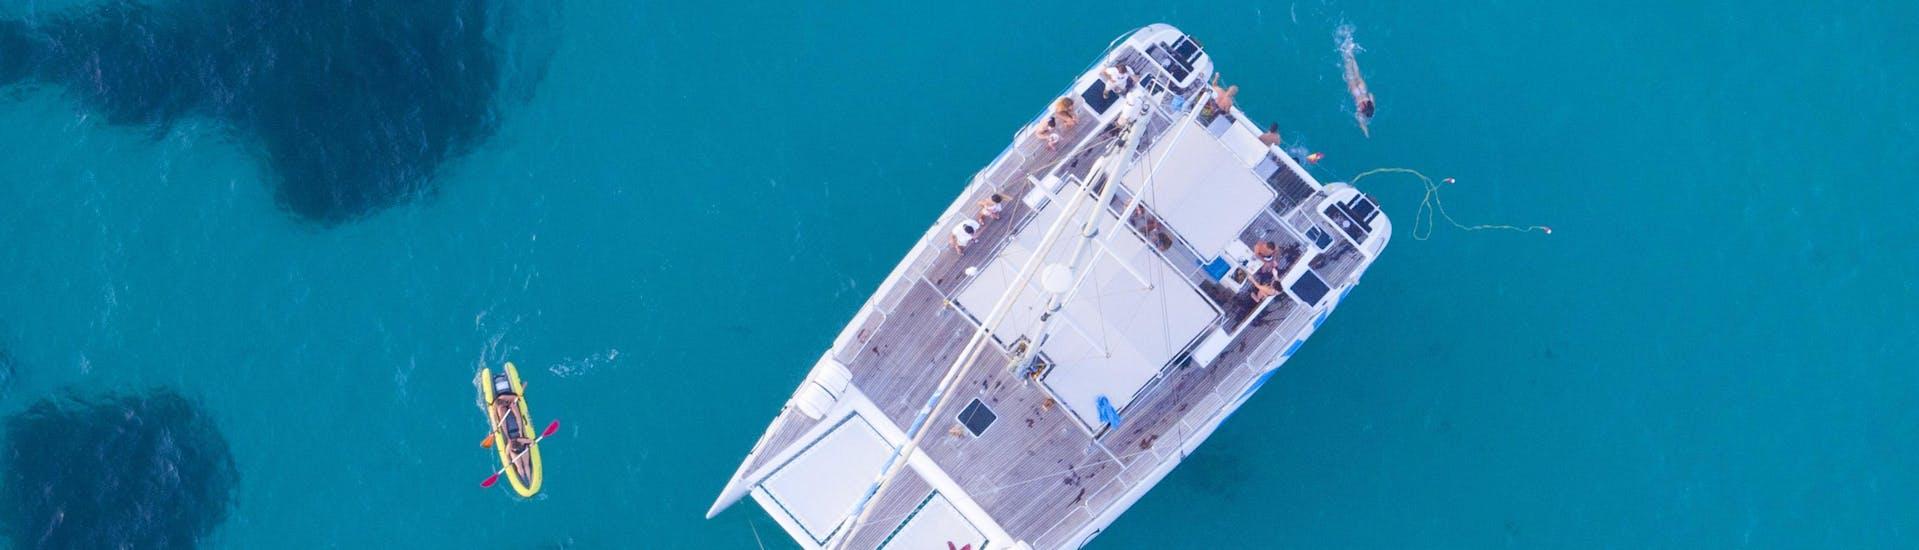 Sailing Catamaran Cruise in the Bay of Palma with Snorkeling with Oasis Catamarán Mallorca - Hero image